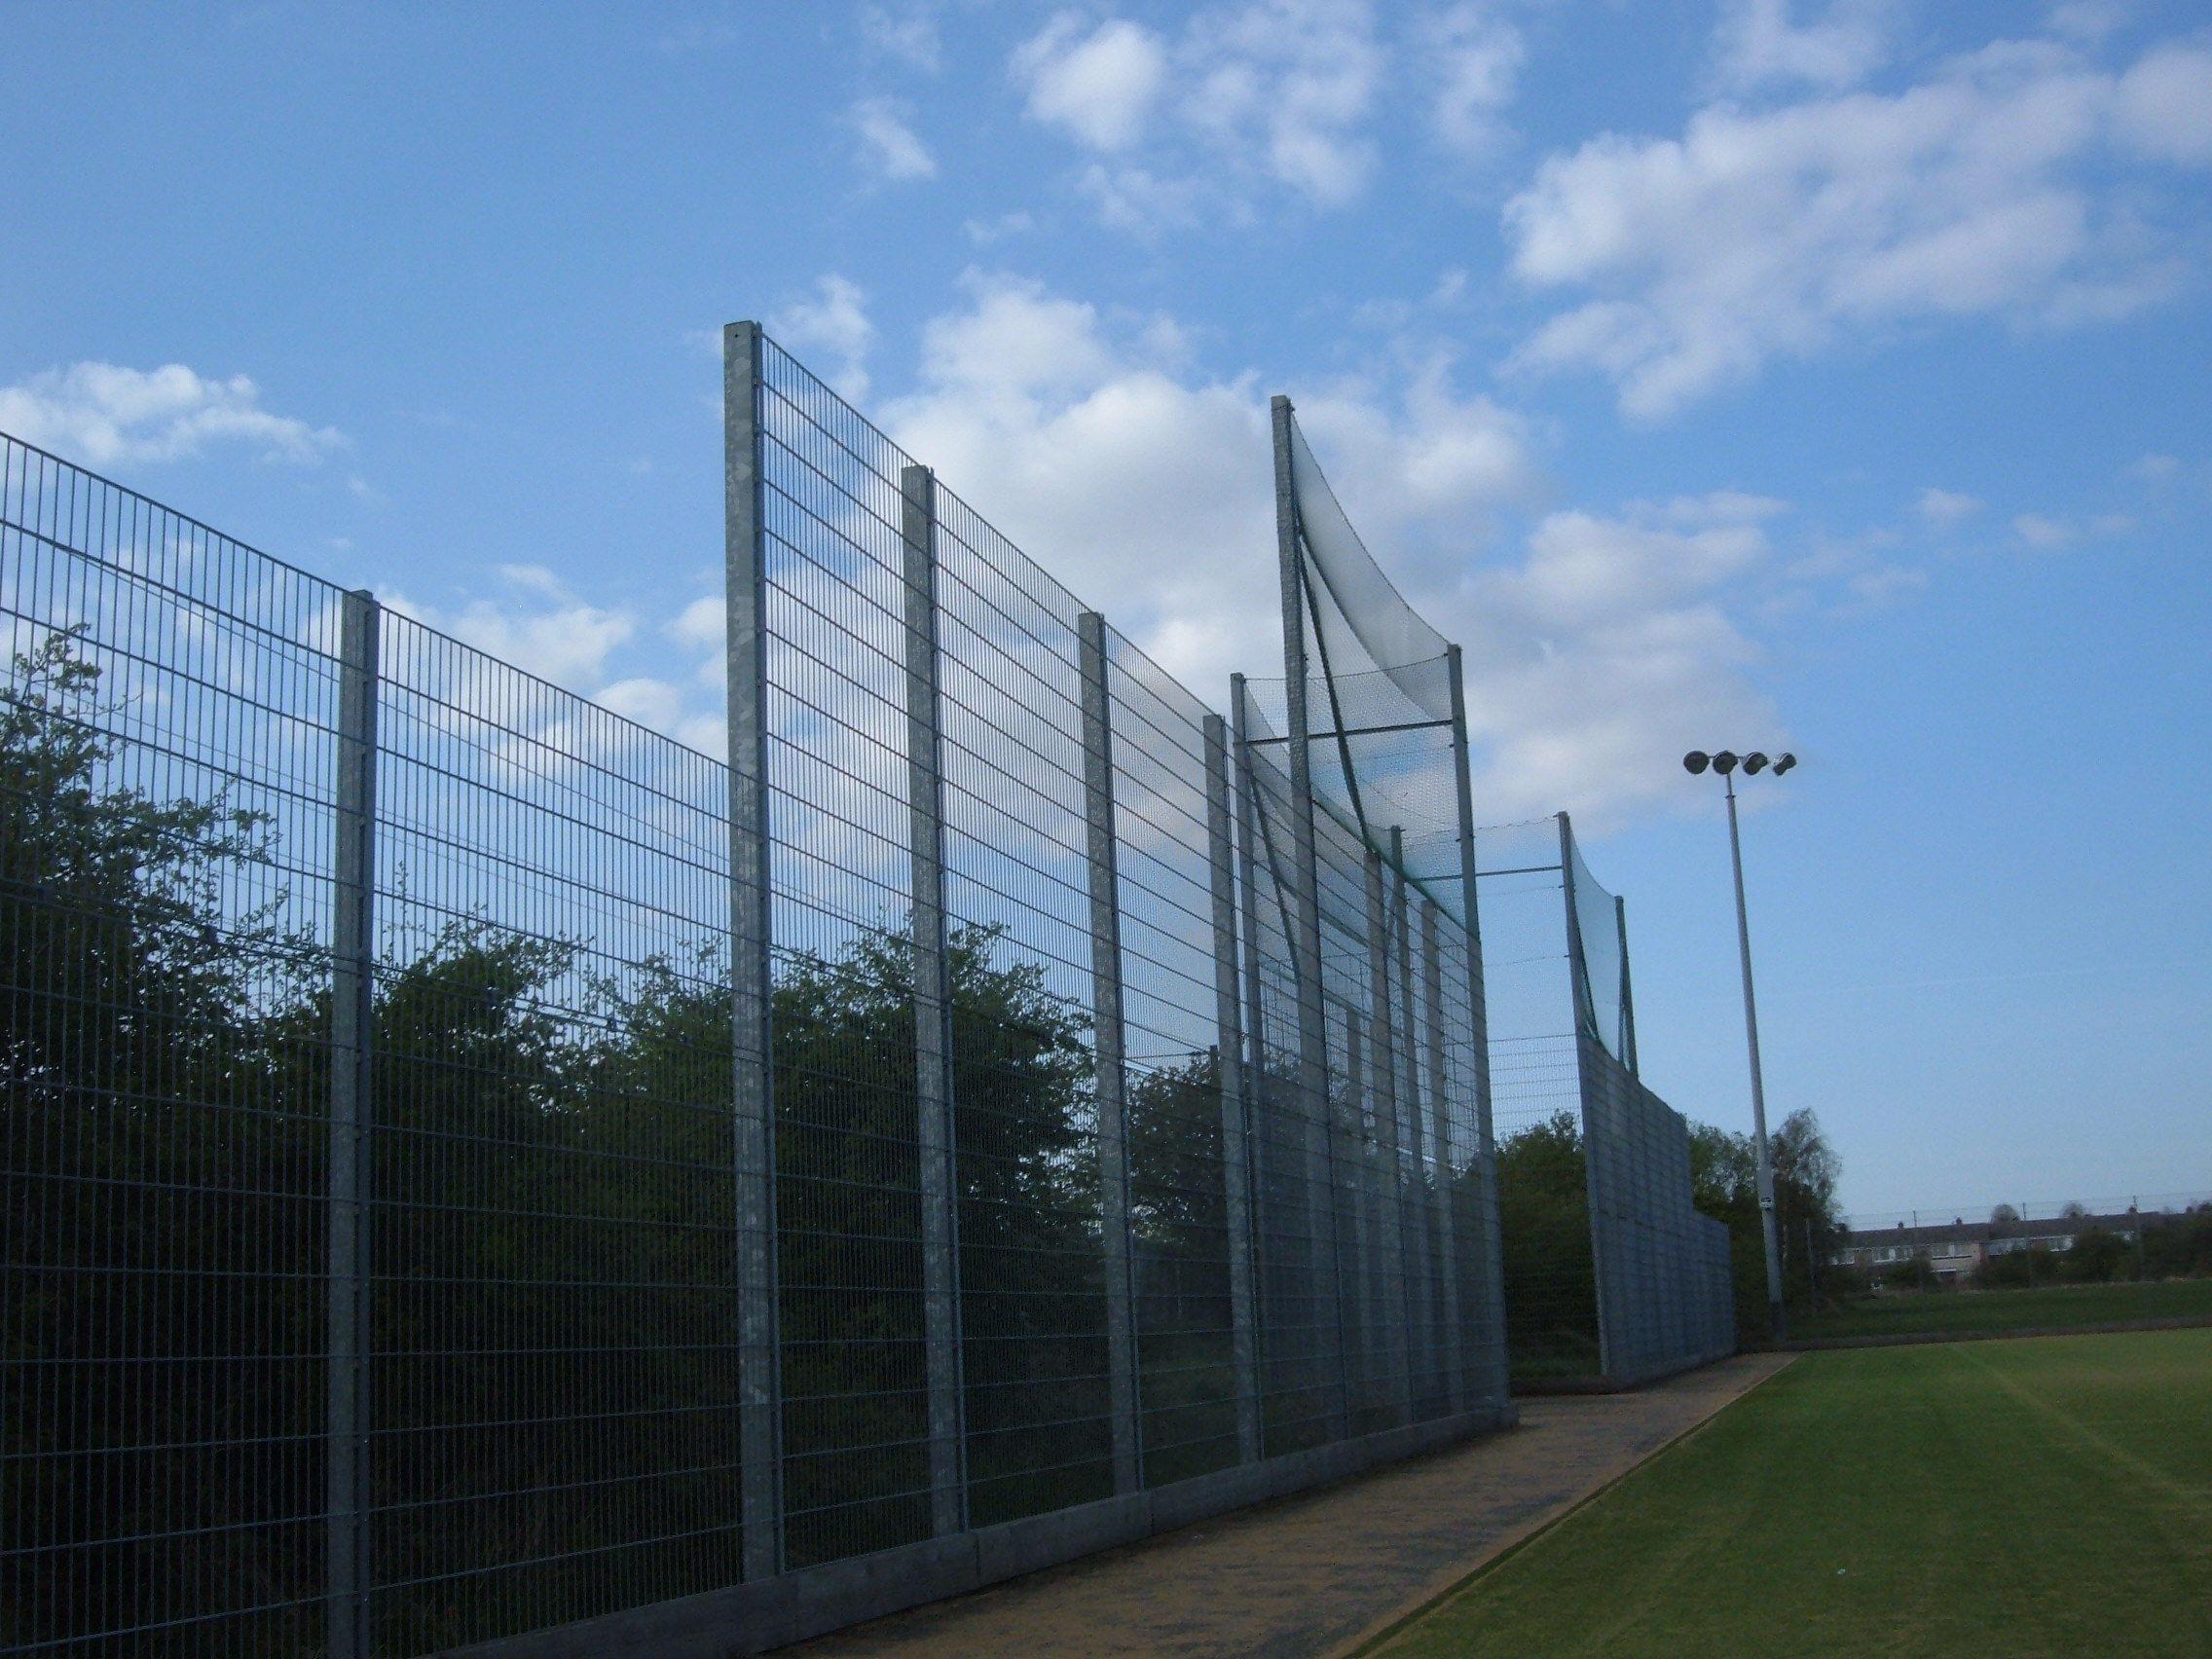 Sports fencing cramlington learning village 2